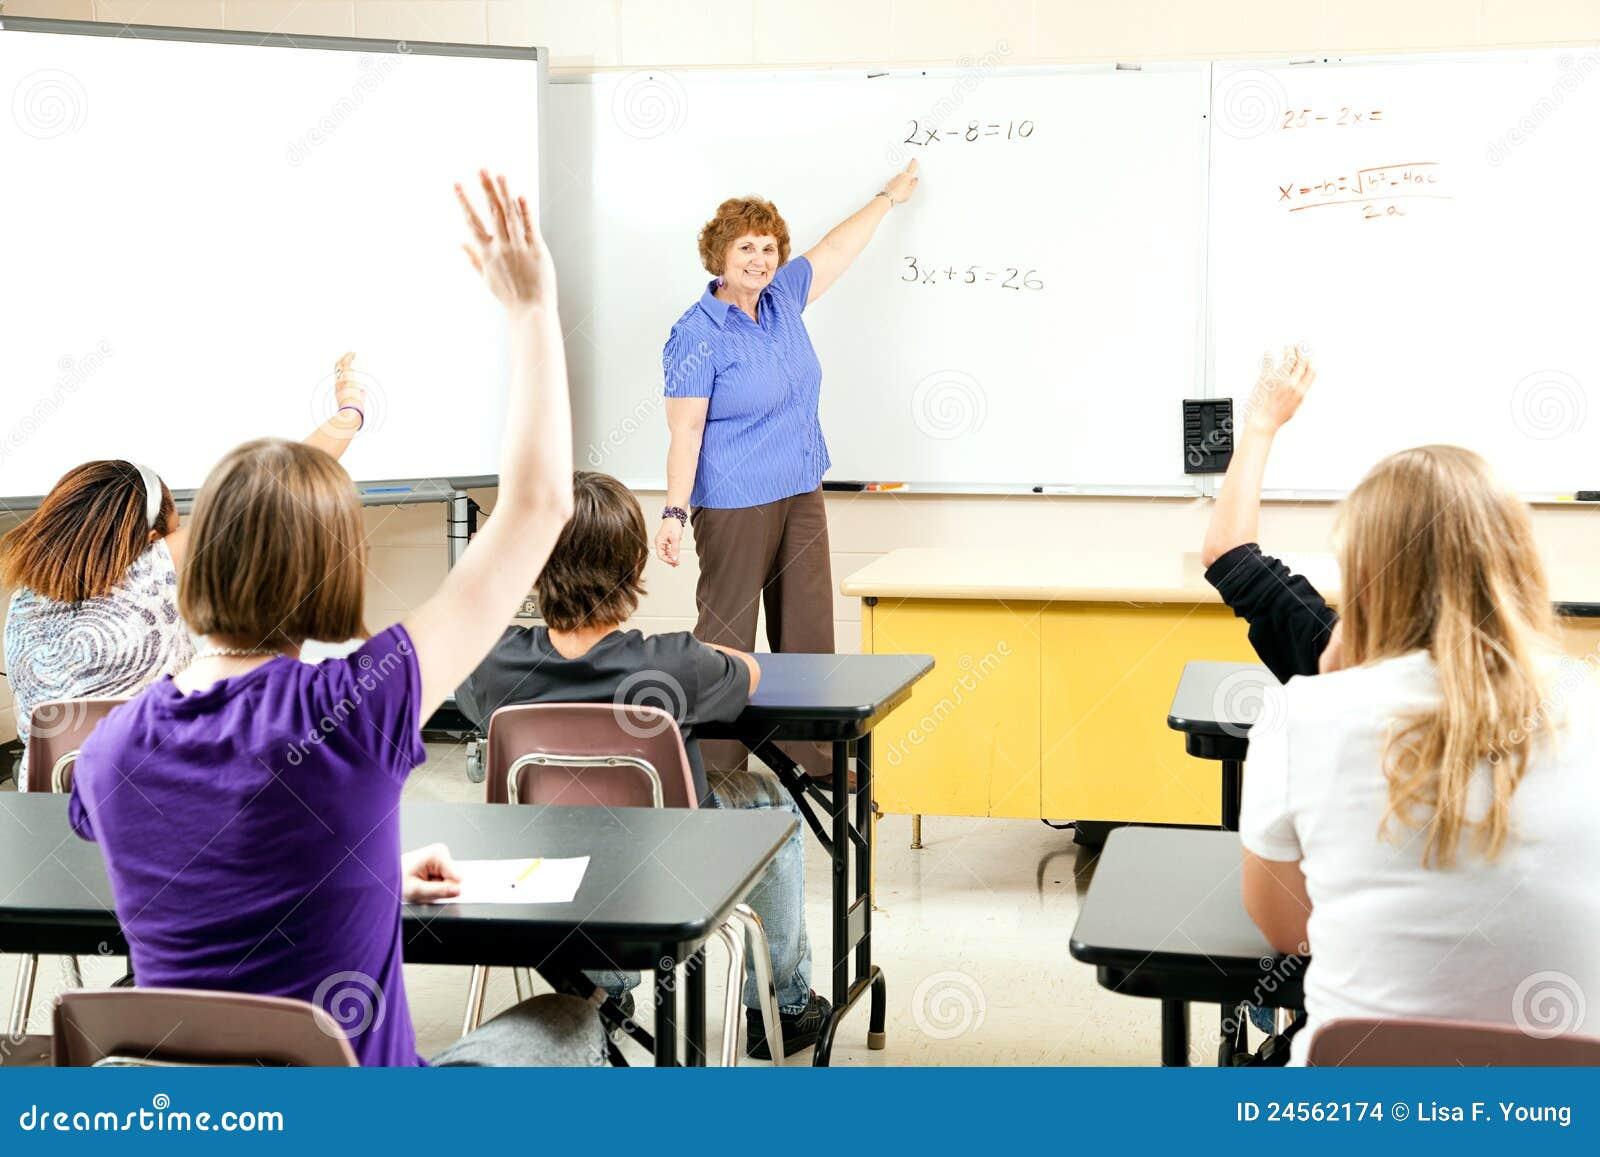 stock photo of teaching algebra class stock images image college algebra clipart algebra clipart pictures